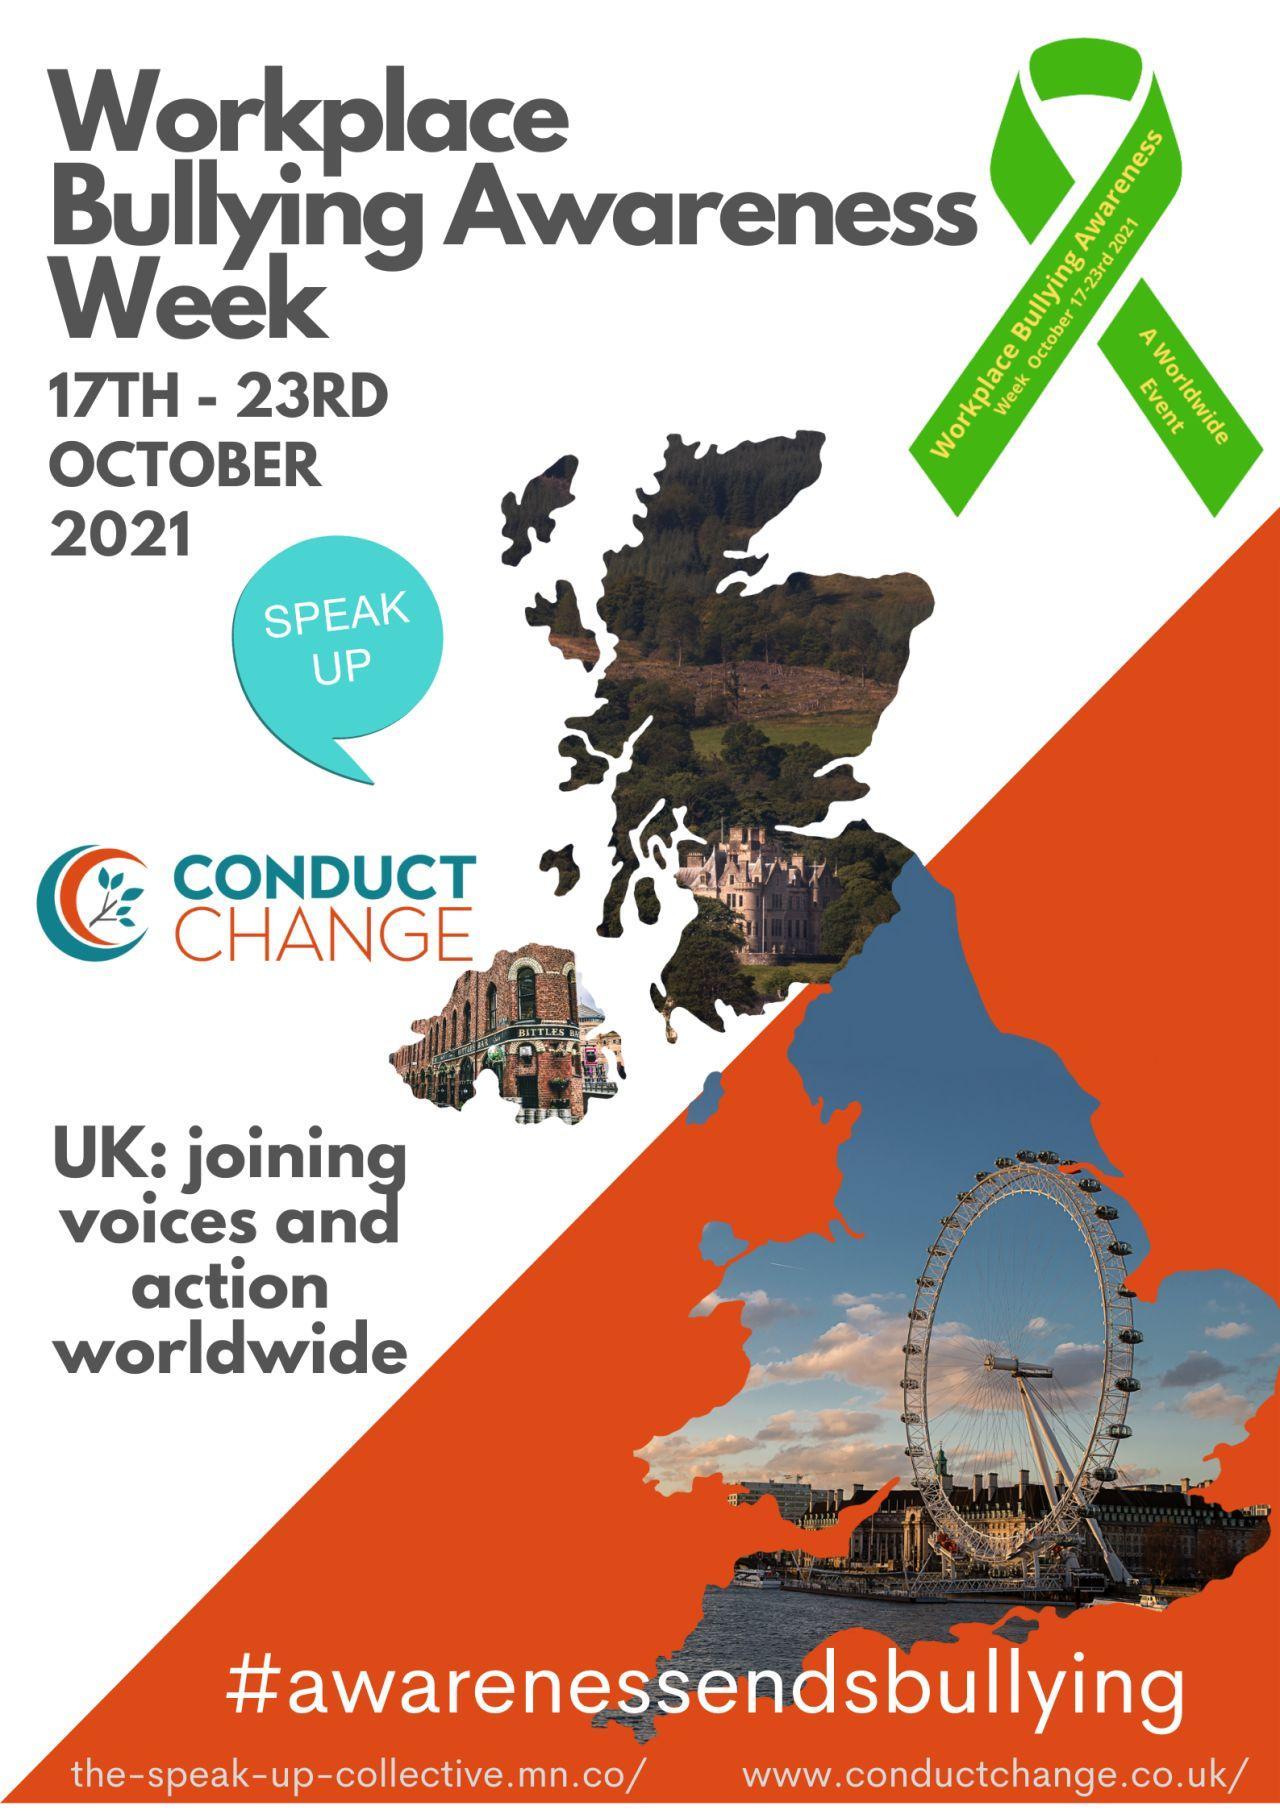 Workplace Bullying Awareness Week 2021, UK